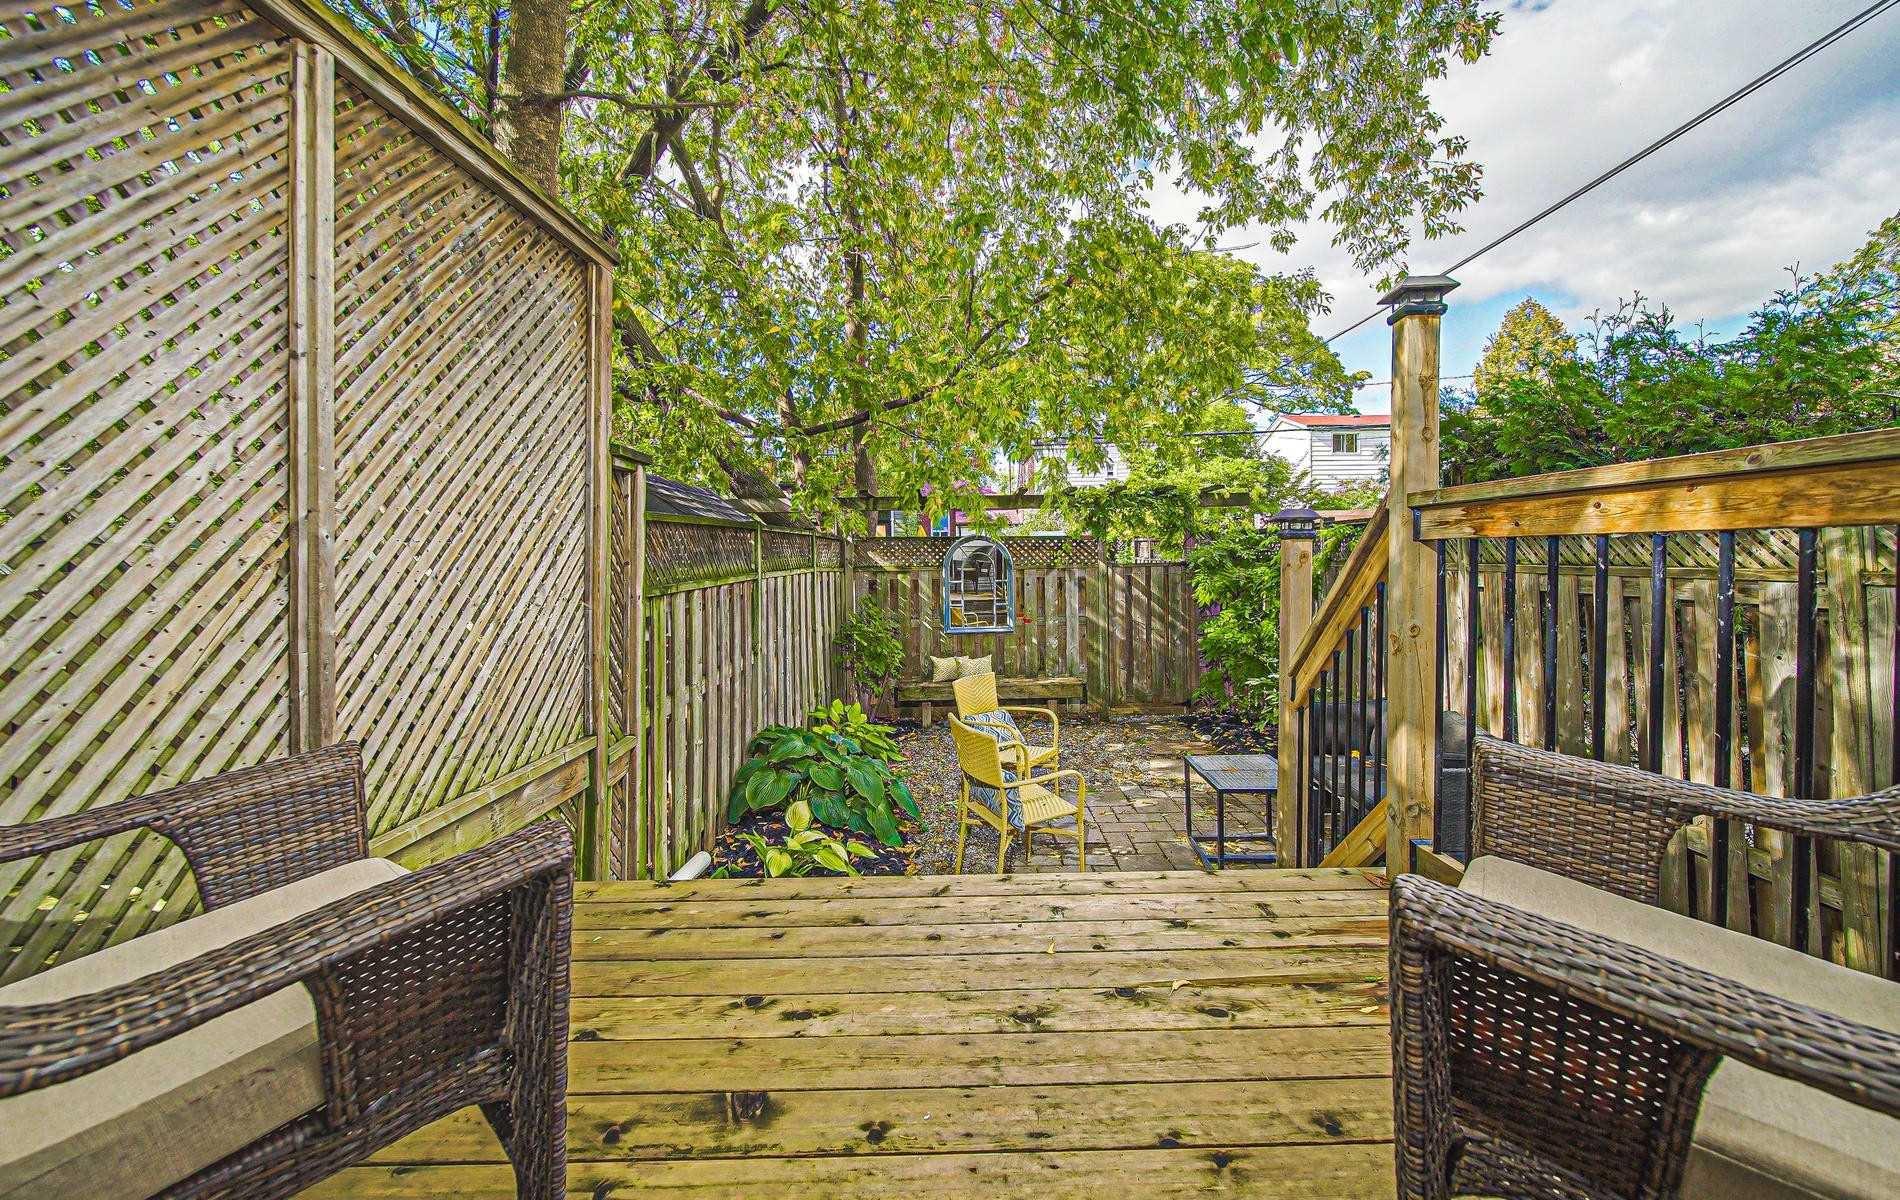 Photo 19: Photos: 84 Rushbrooke Avenue in Toronto: South Riverdale House (2-Storey) for sale (Toronto E01)  : MLS®# E4600791